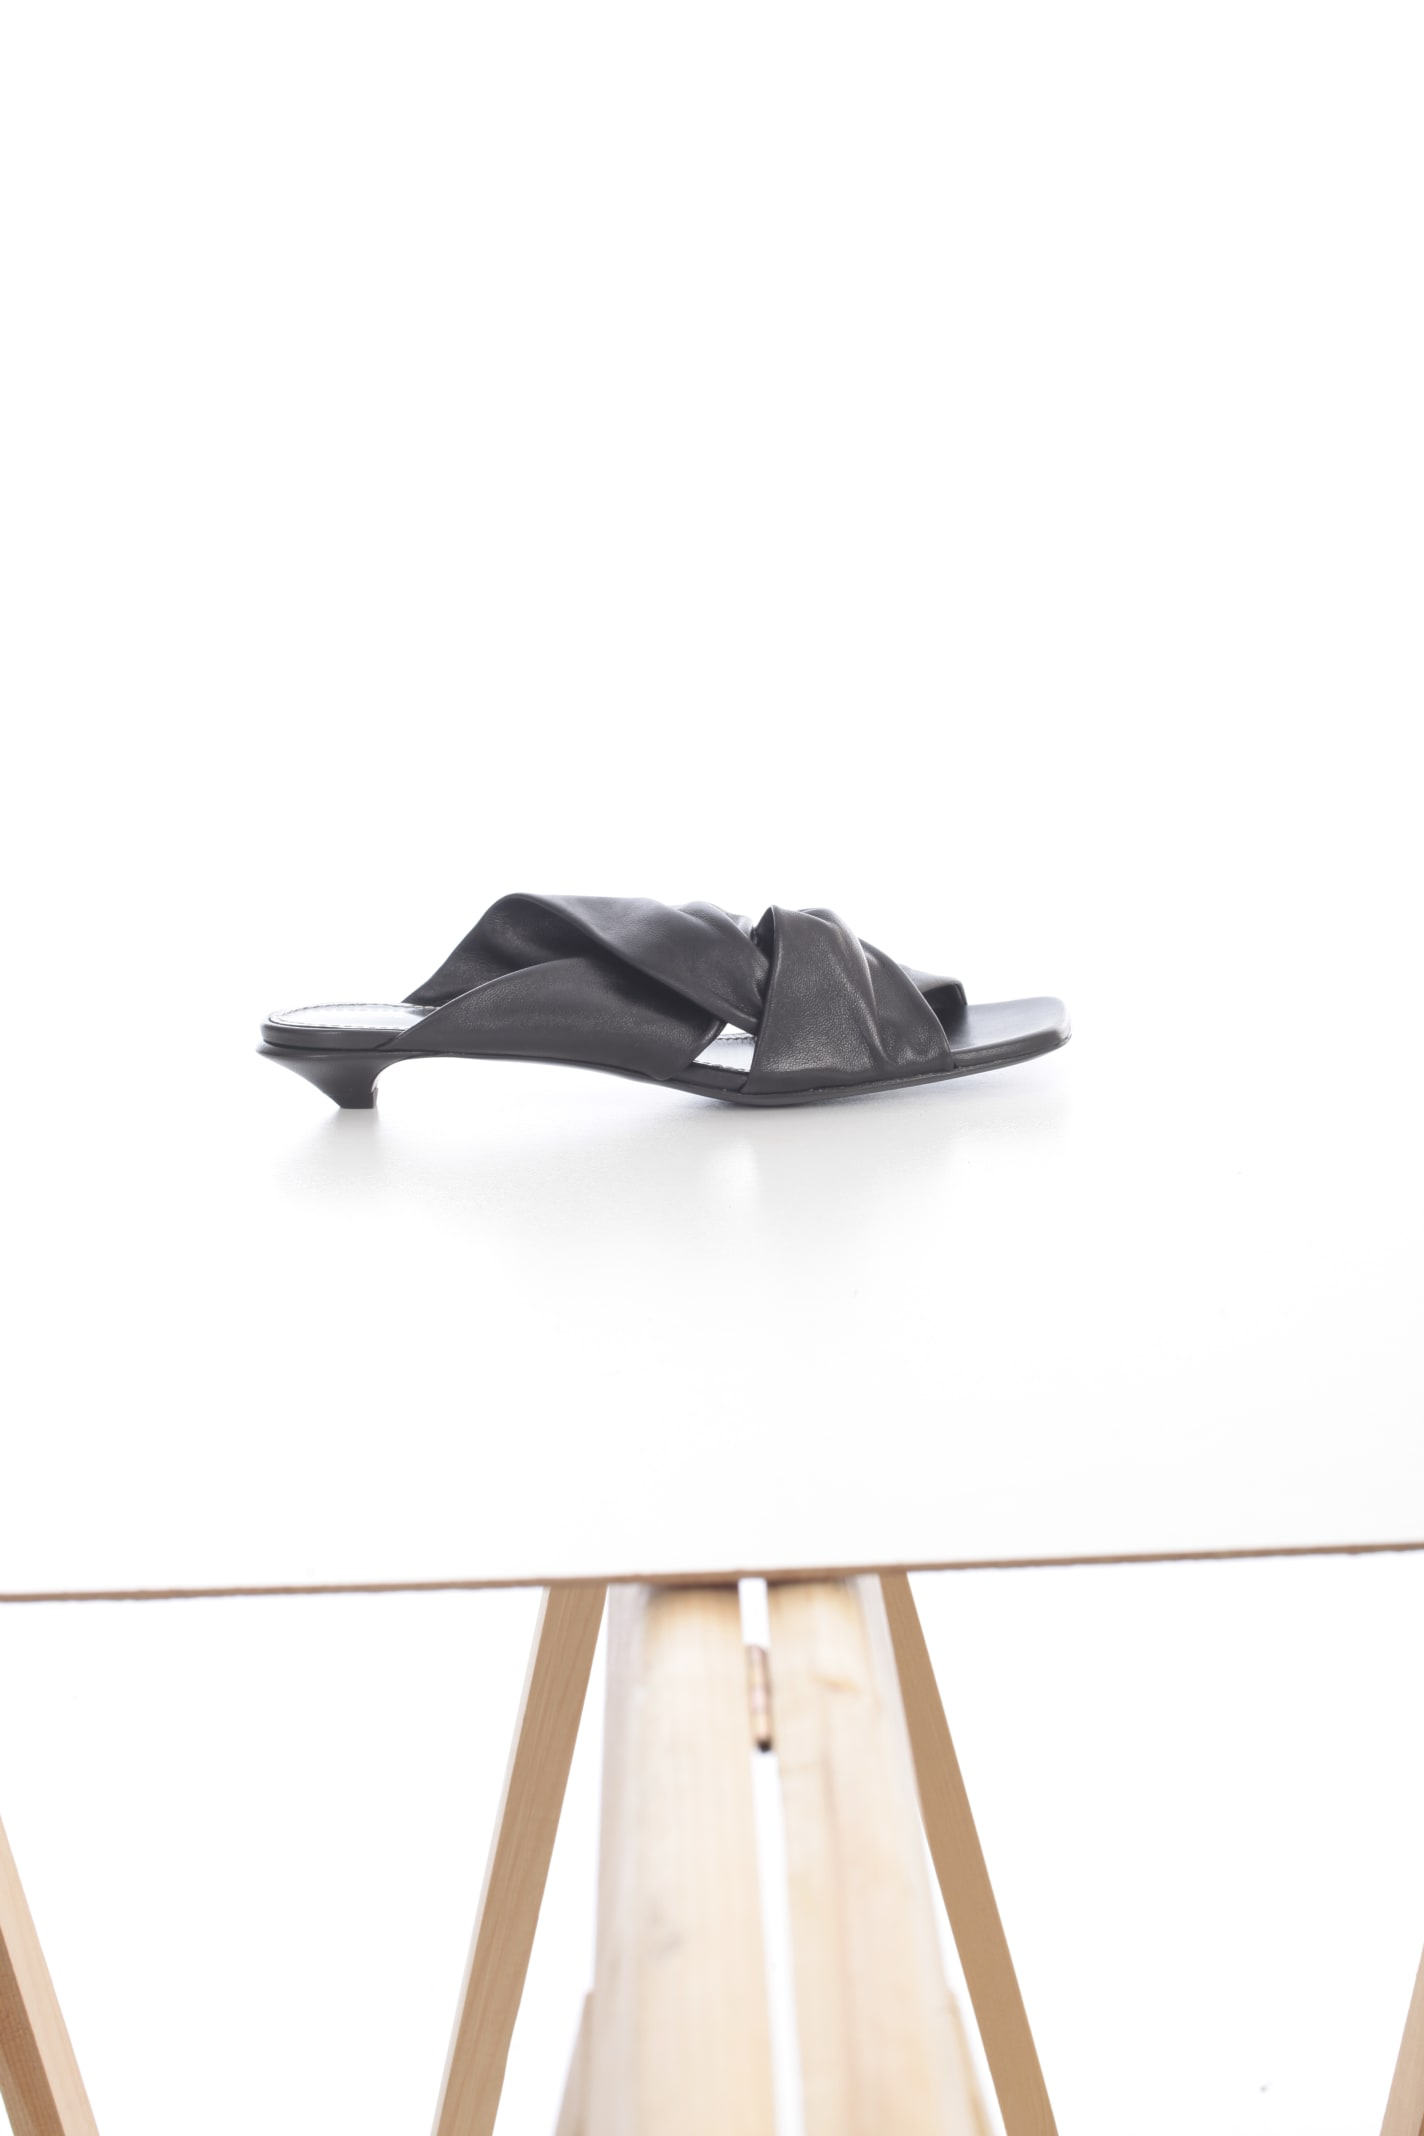 Proenza Schouler OPEN TOE SANDALS W/2 STRAPS